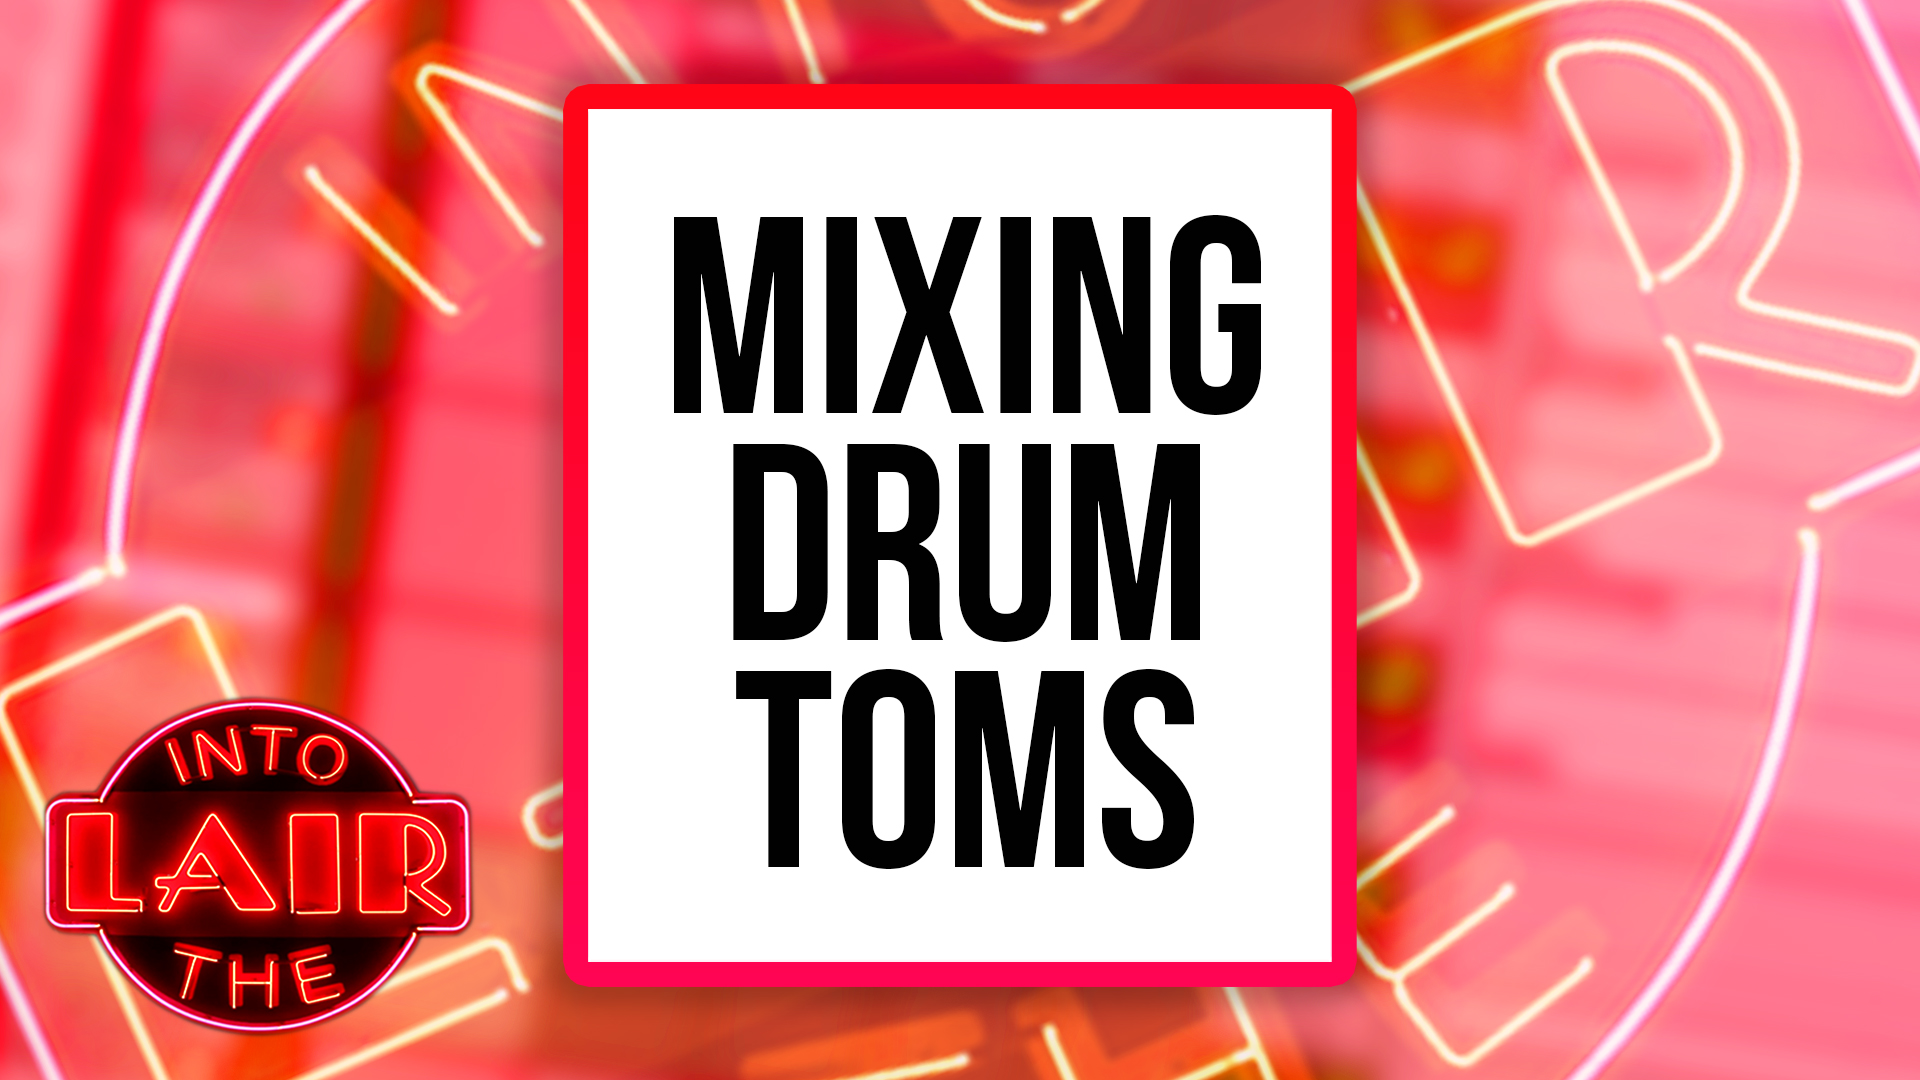 Mixing Drum Toms